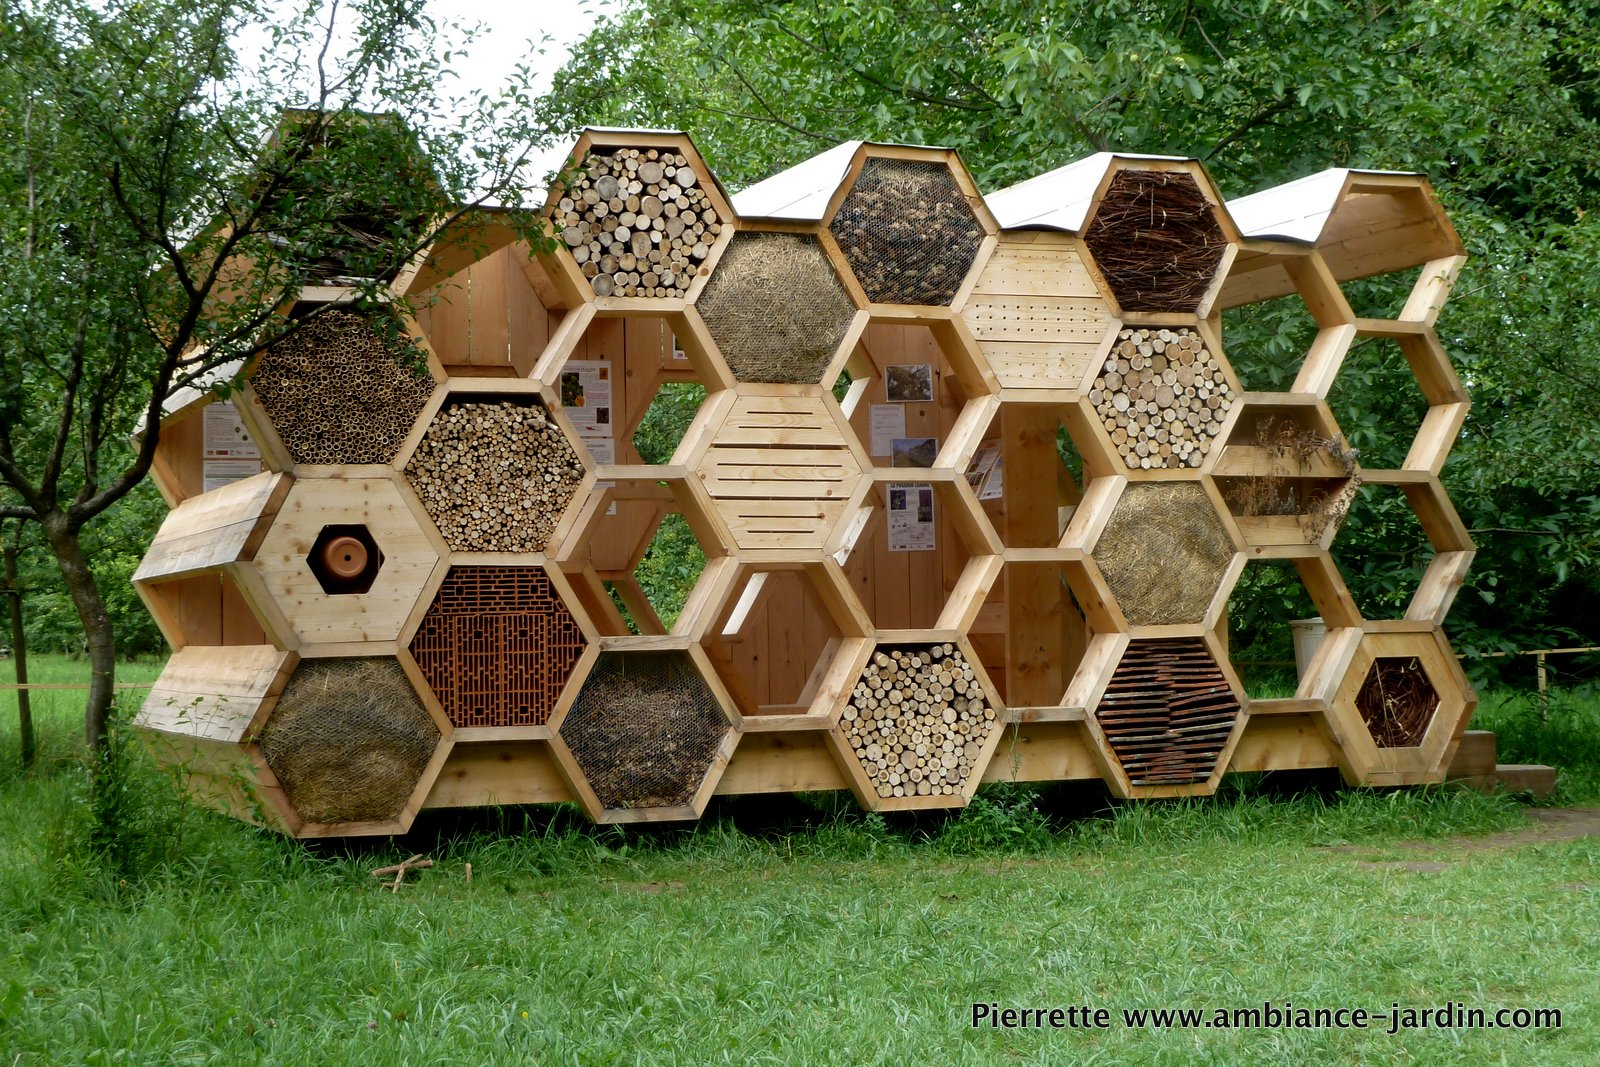 Ambiance jardin archi 20 hotel abeilles bienen hotel for Ambiance jardin bed and breakfast